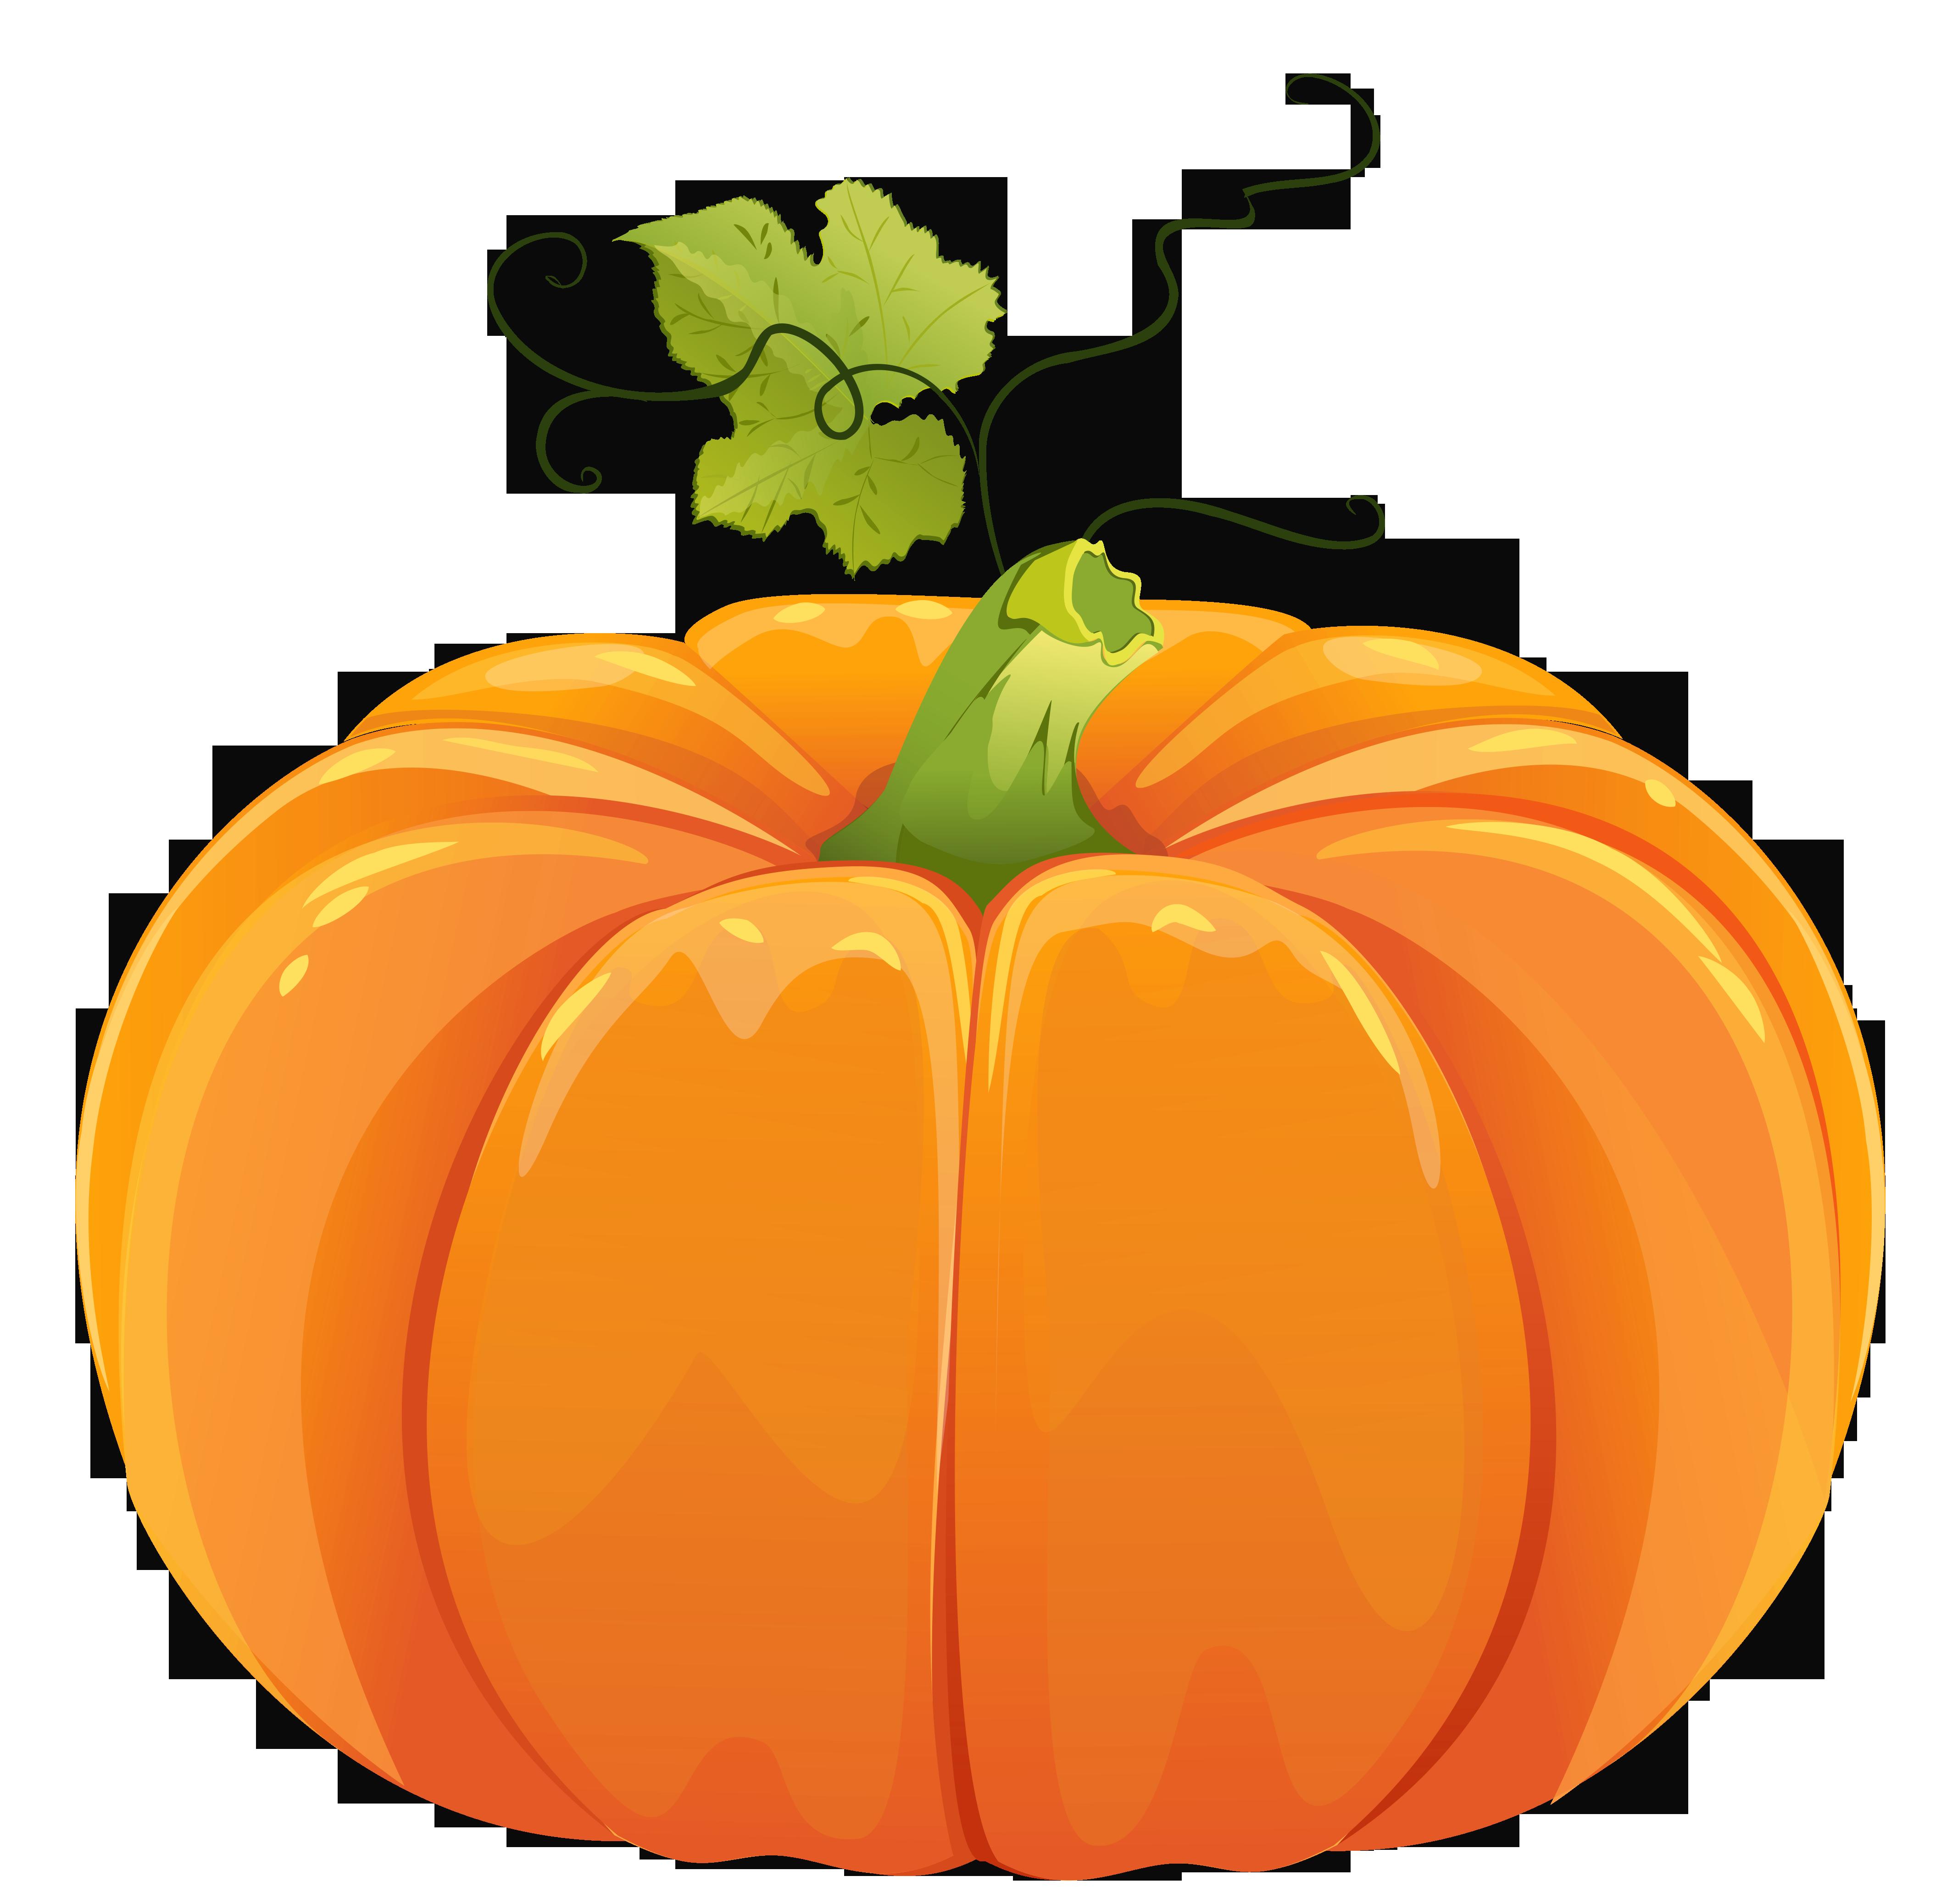 Autumn pumpkin clipart.